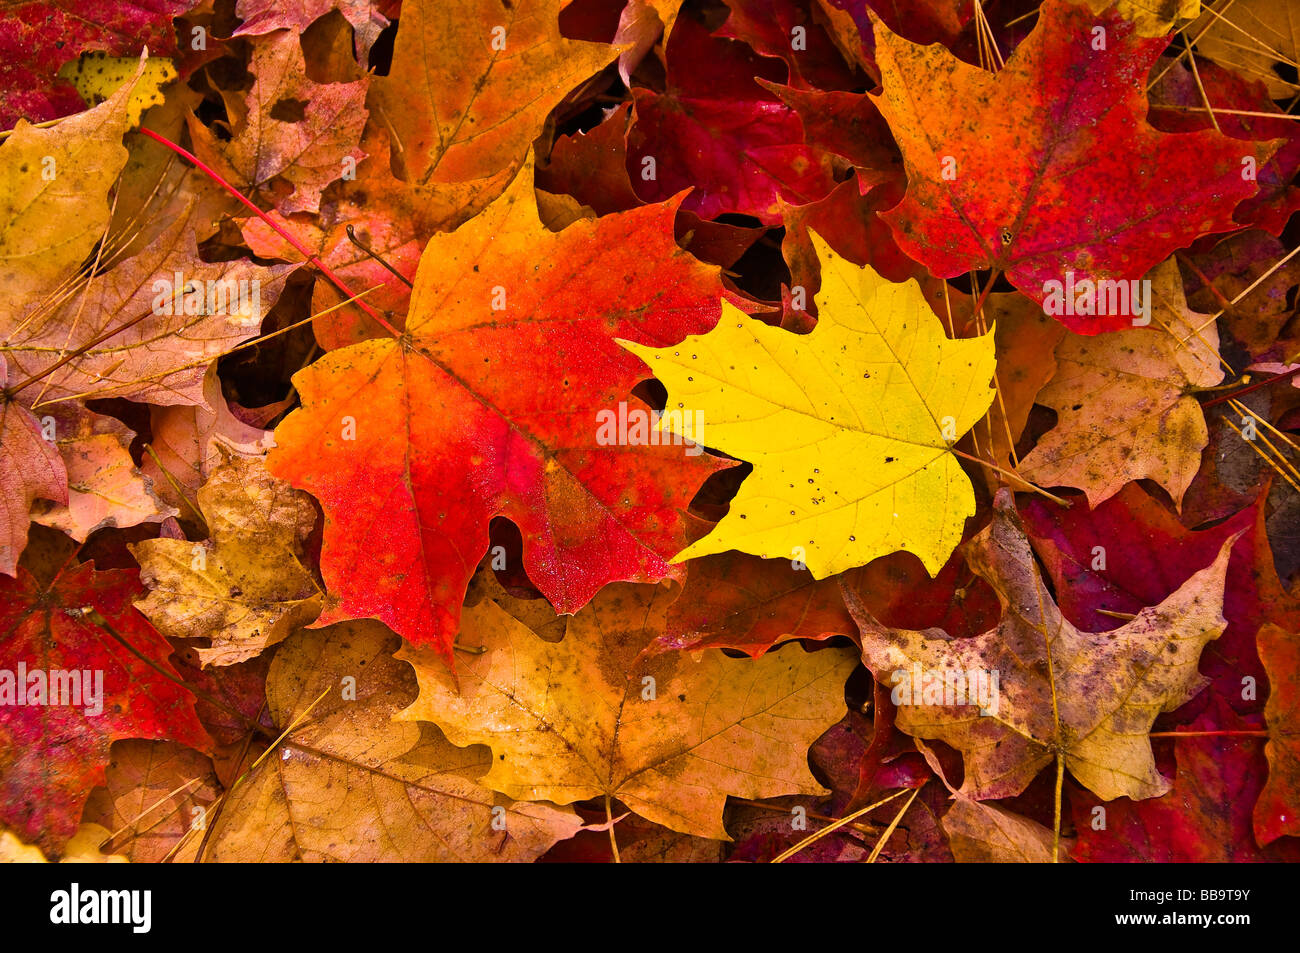 Closeup Of Autumn Leaves In Algonquin Park Ontario Canada Stock Photo Alamy